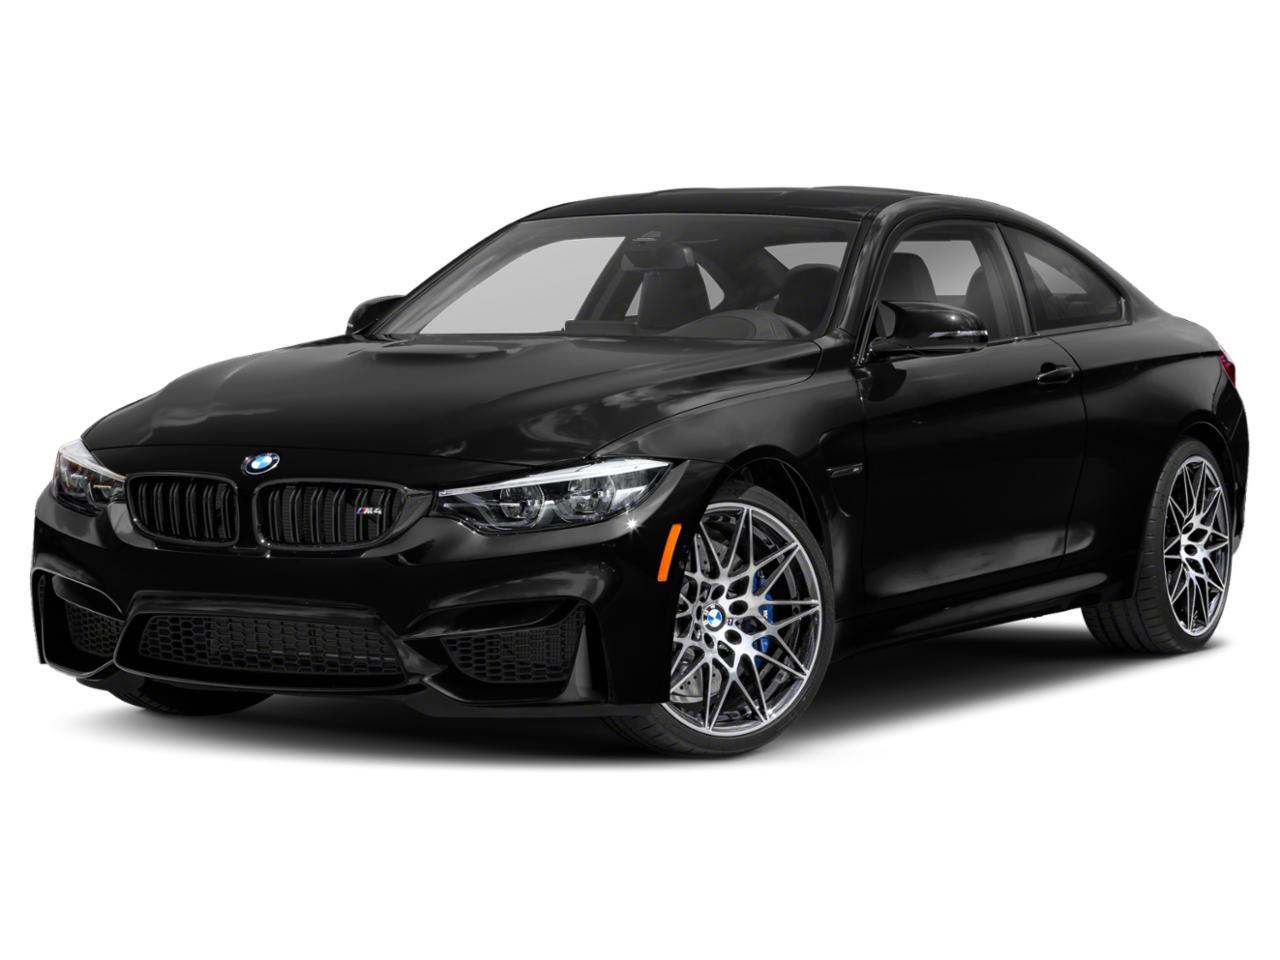 2018 BMW M4 Vehicle Photo in Pleasanton, CA 94588